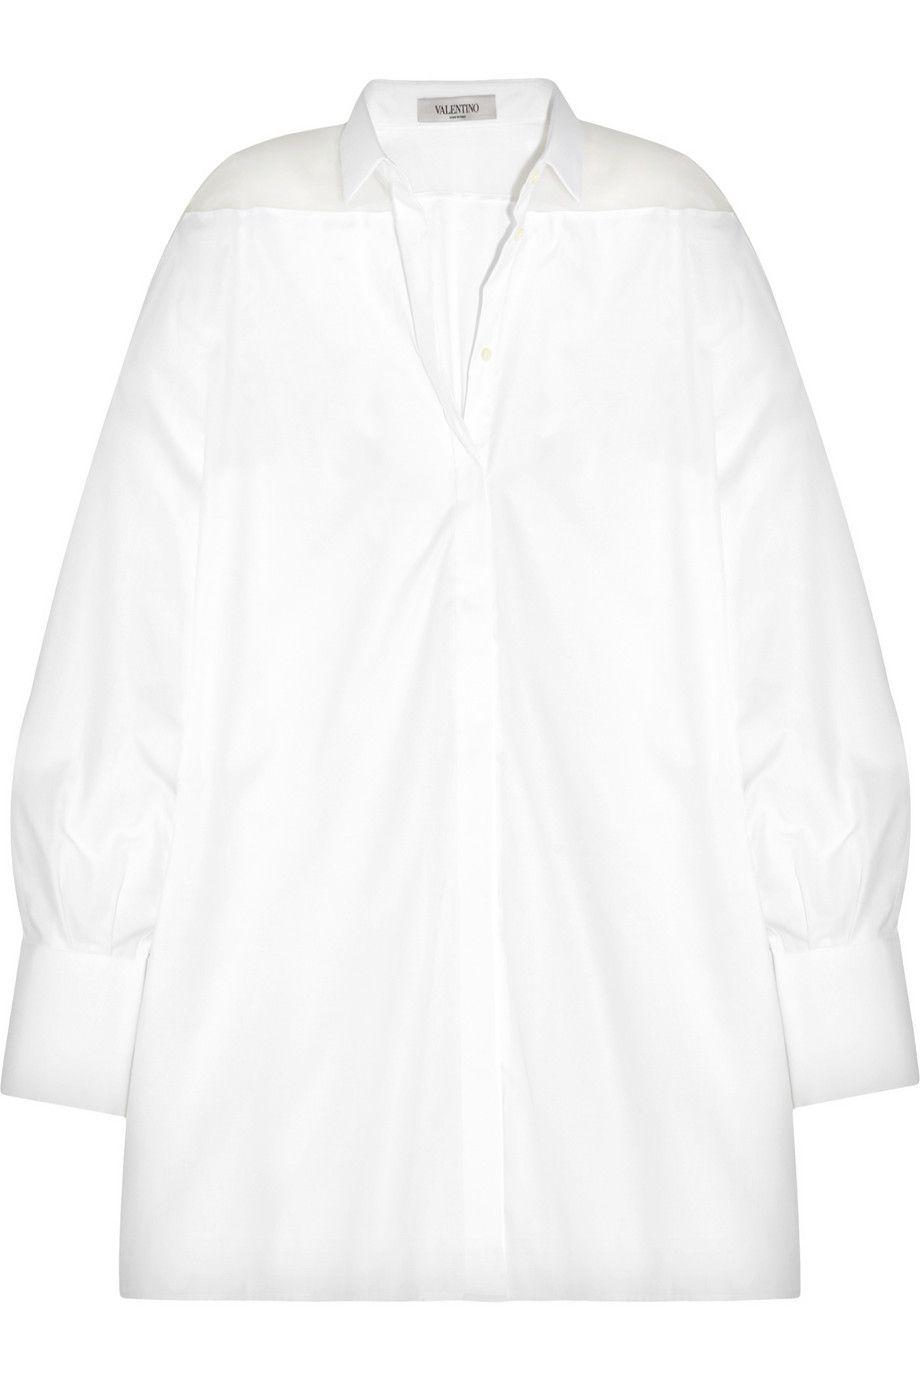 Valentino Oversized silk organza-paneled cotton-poplin shirt NET-A-PORTER.COM